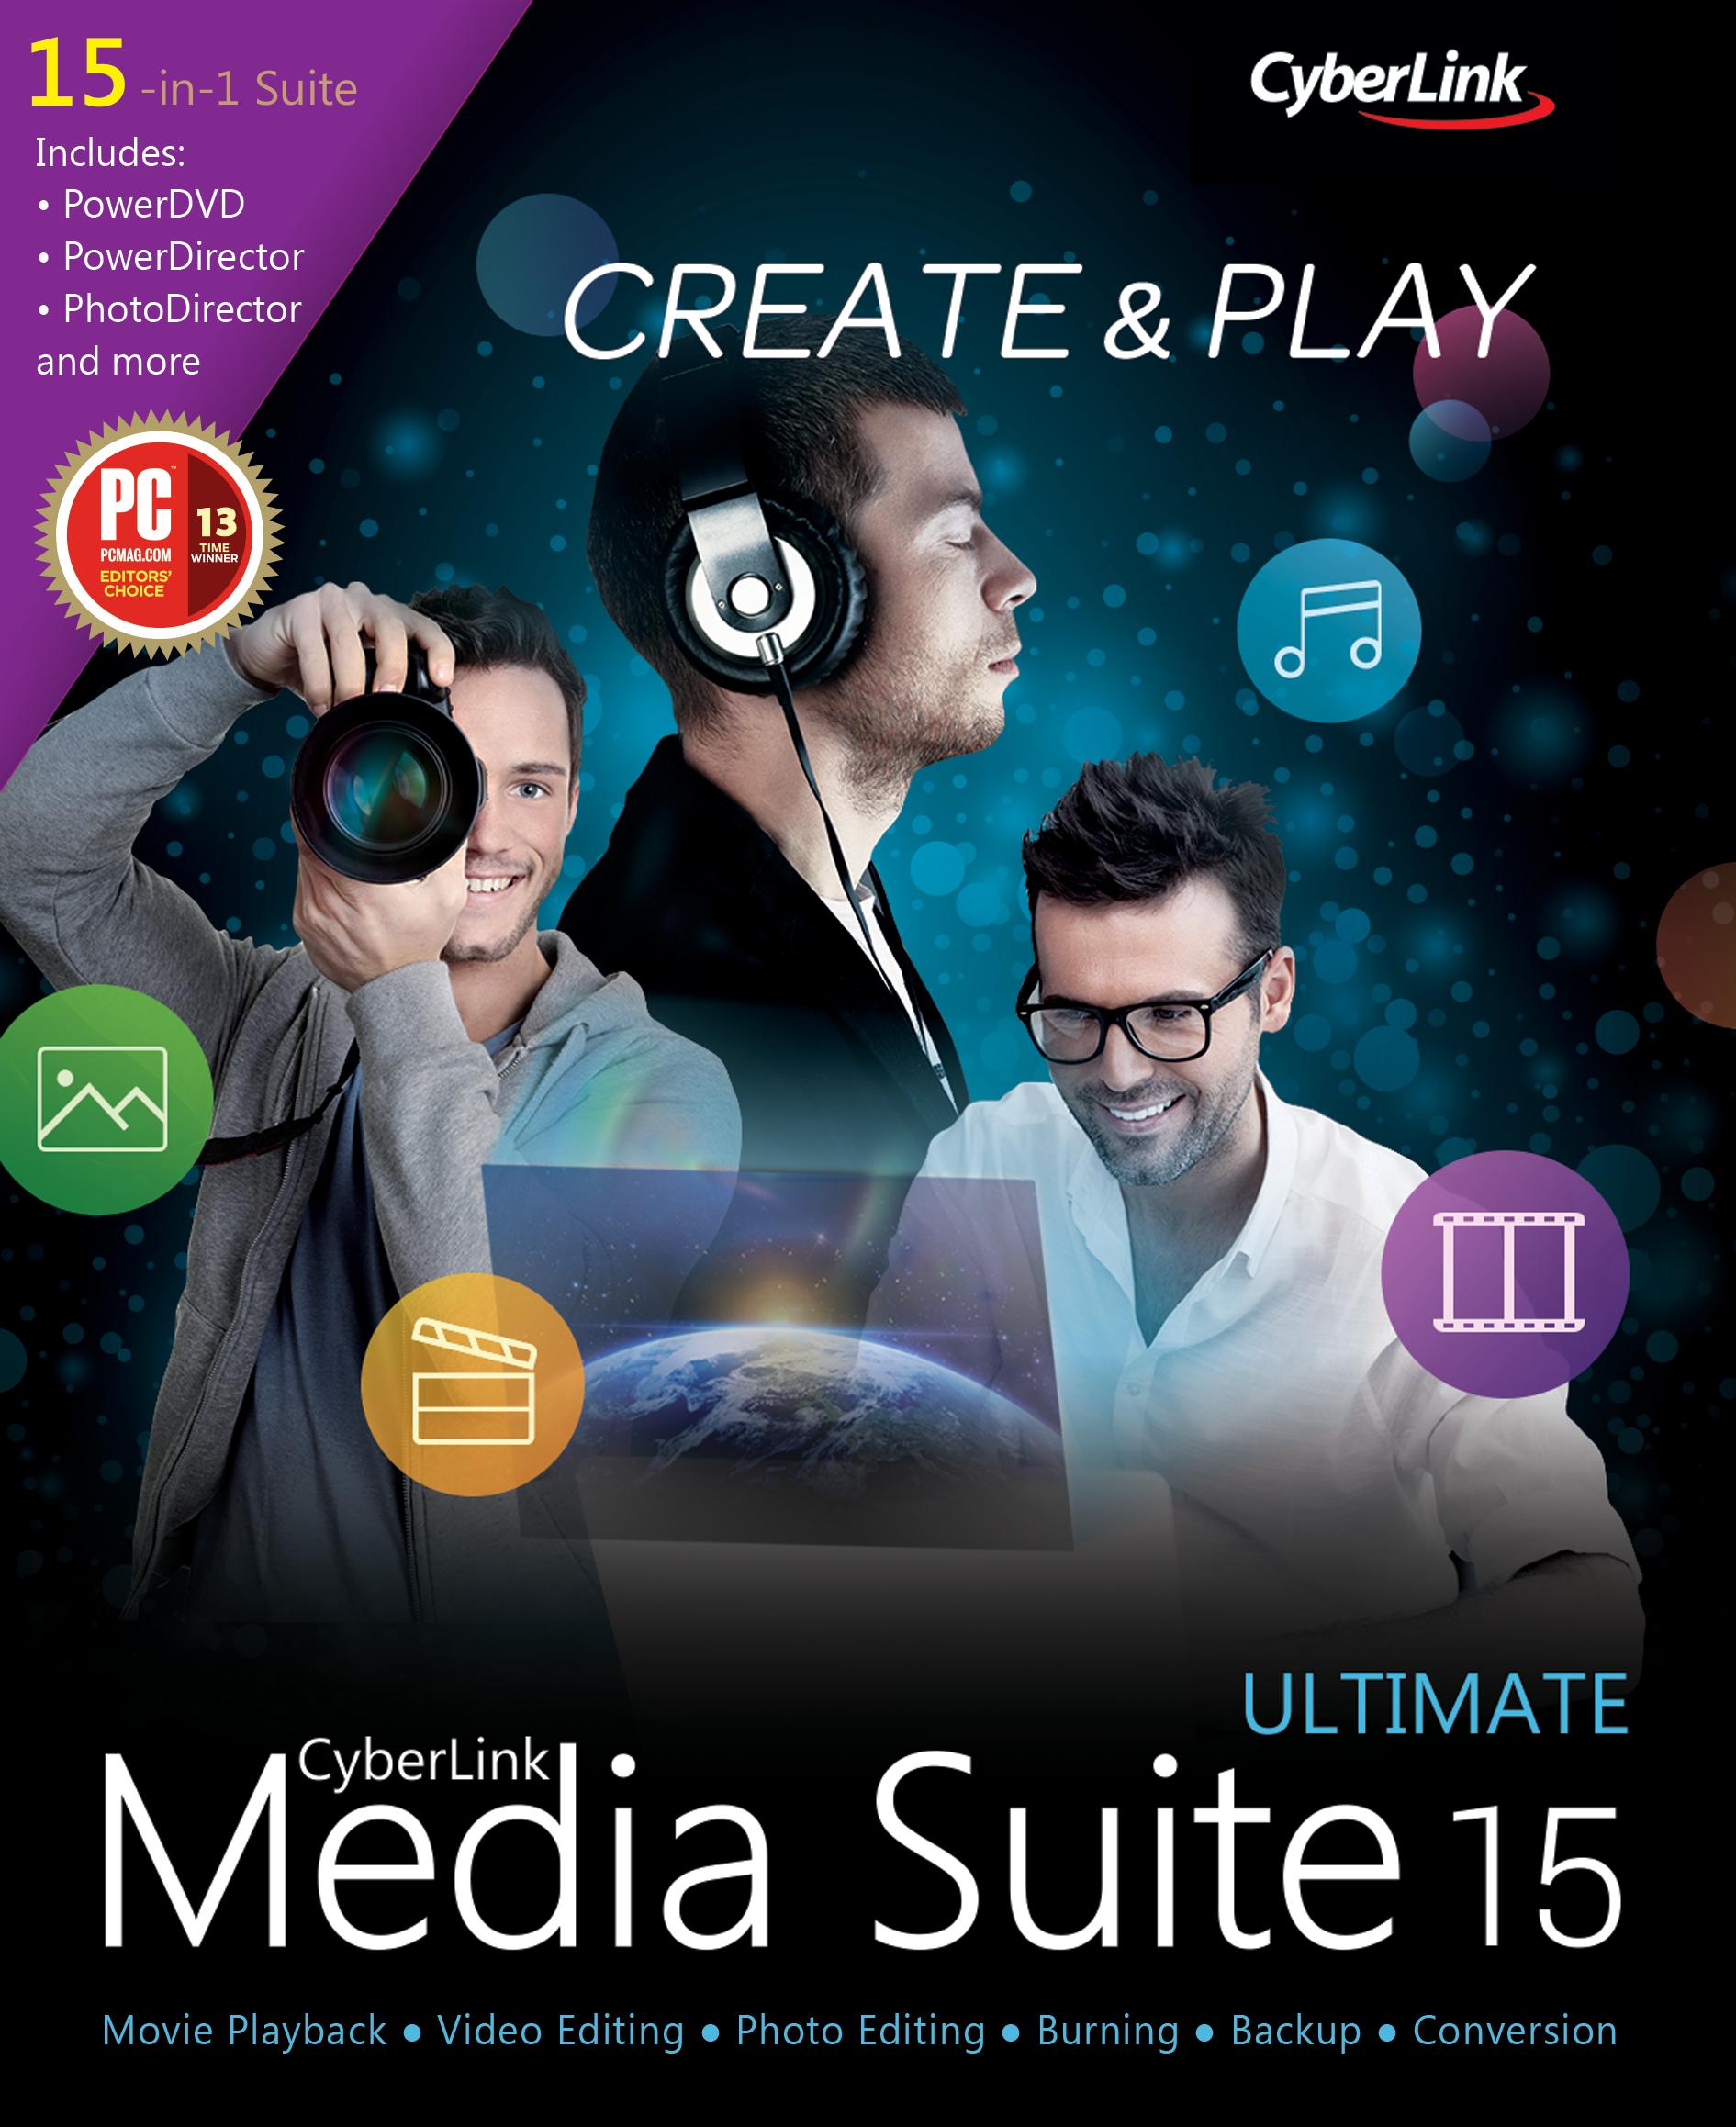 cyberlink-media-suite-15-ultimate-download